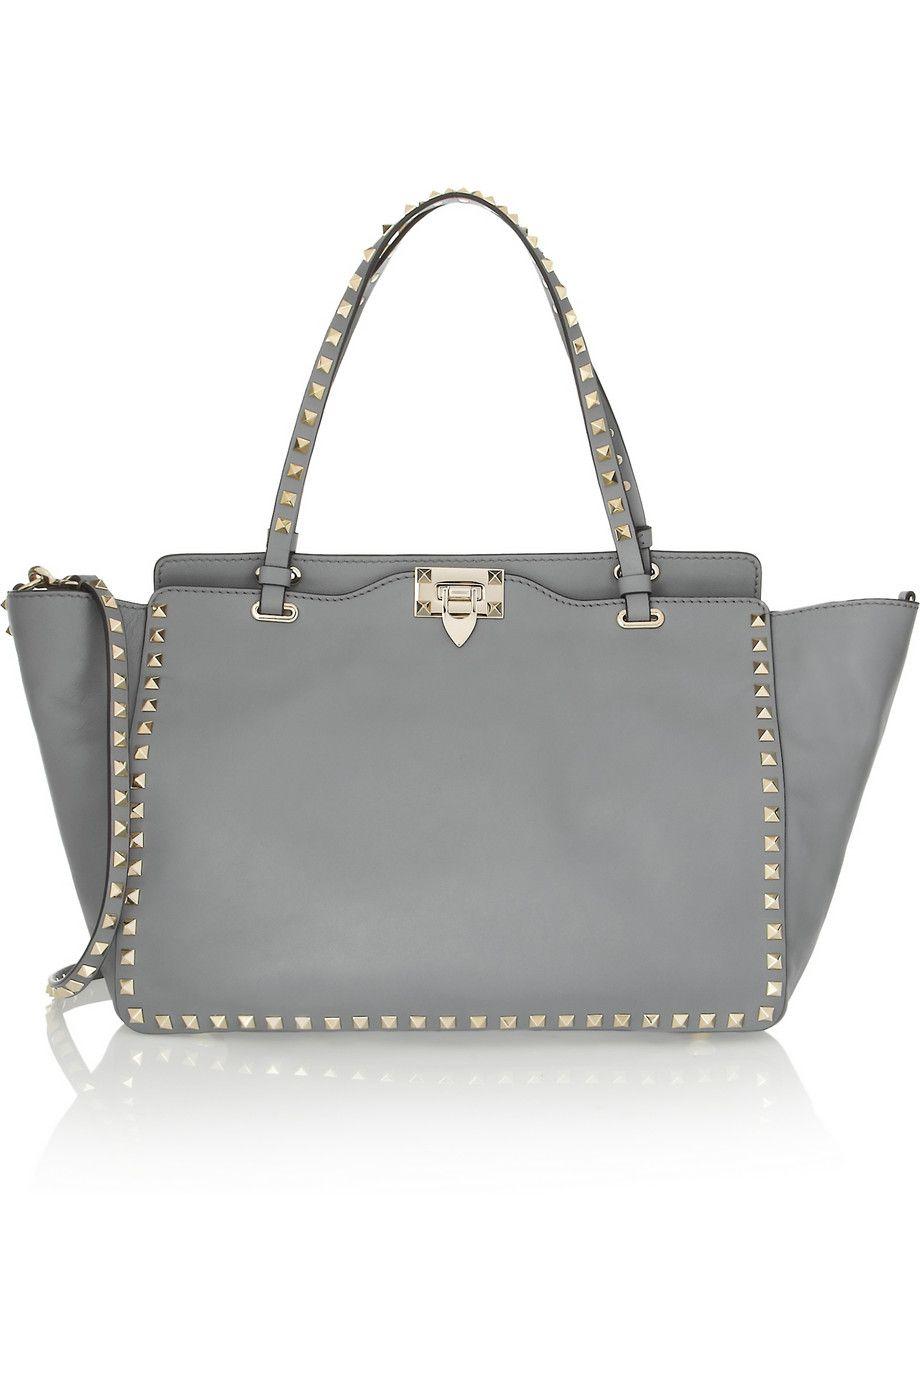 Valentino Garavani The Rockstud Medium Leather Trapeze Bag - Blush Valentino OcPAKU8emF